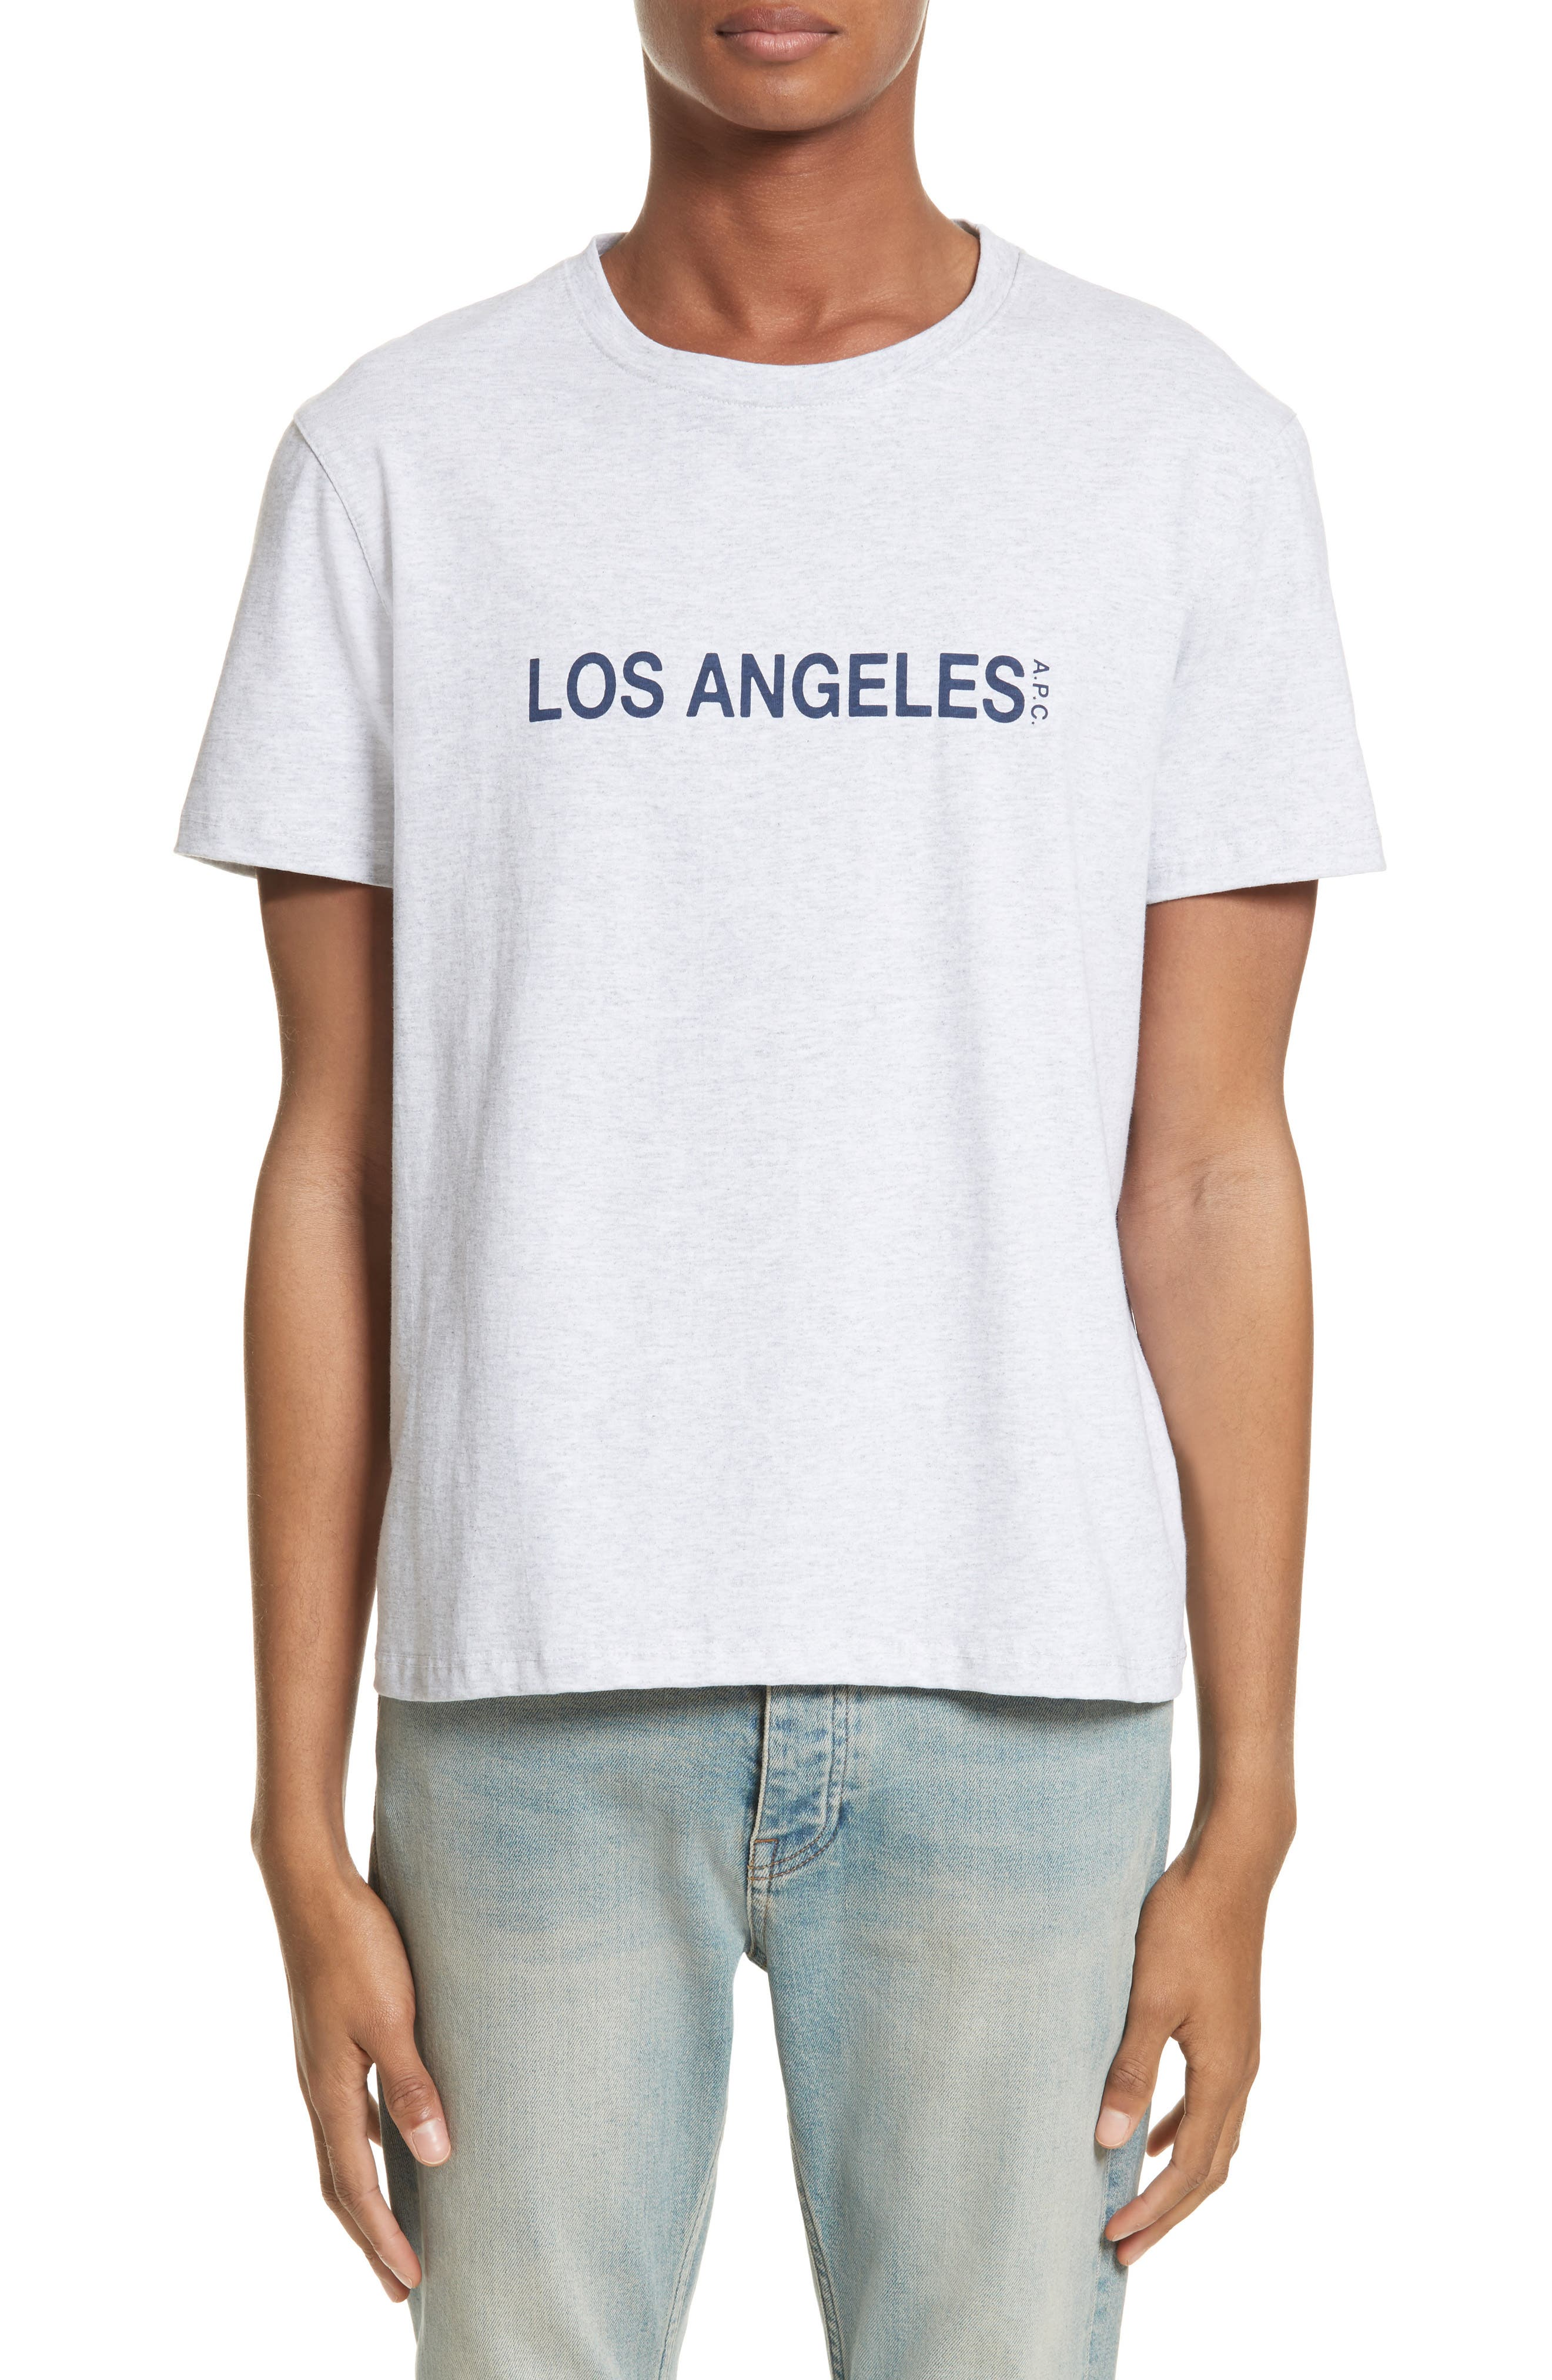 Los Angeles Graphic T-Shirt,                             Main thumbnail 1, color,                             063